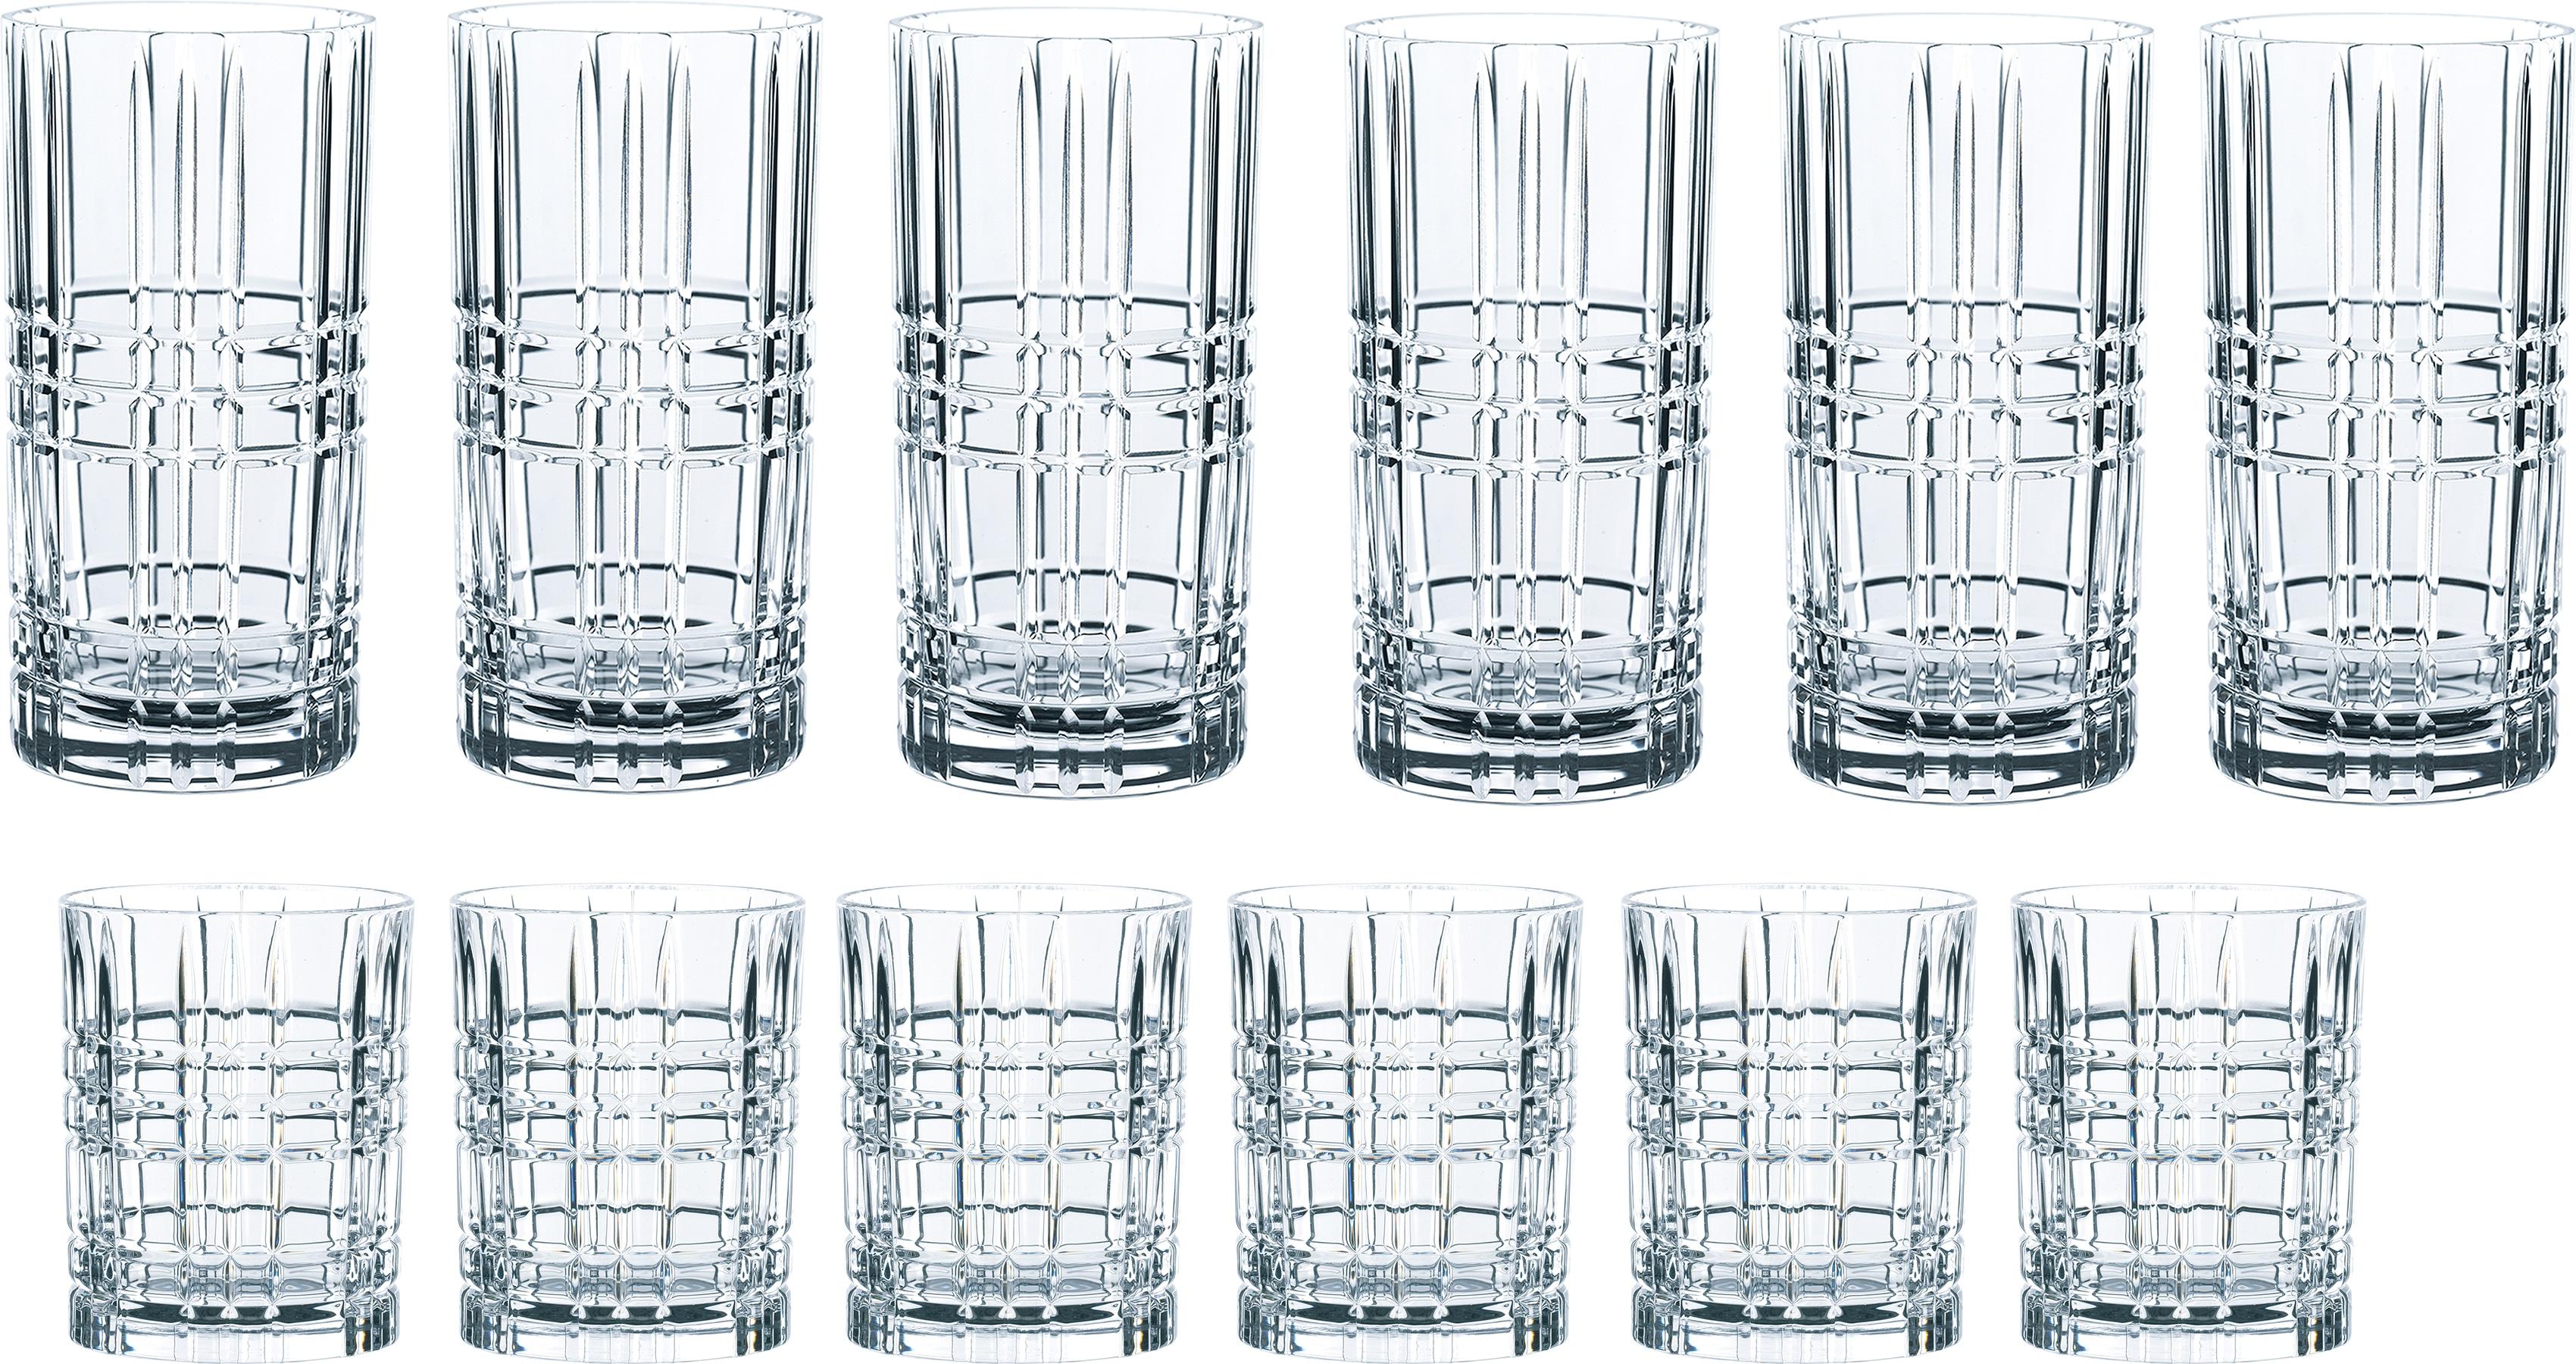 Nachtmann Gläser-Set Highland, (Set, 12 tlg.), mit markantem Schliff, 12-teilig farblos Kristallgläser Gläser Glaswaren Haushaltswaren